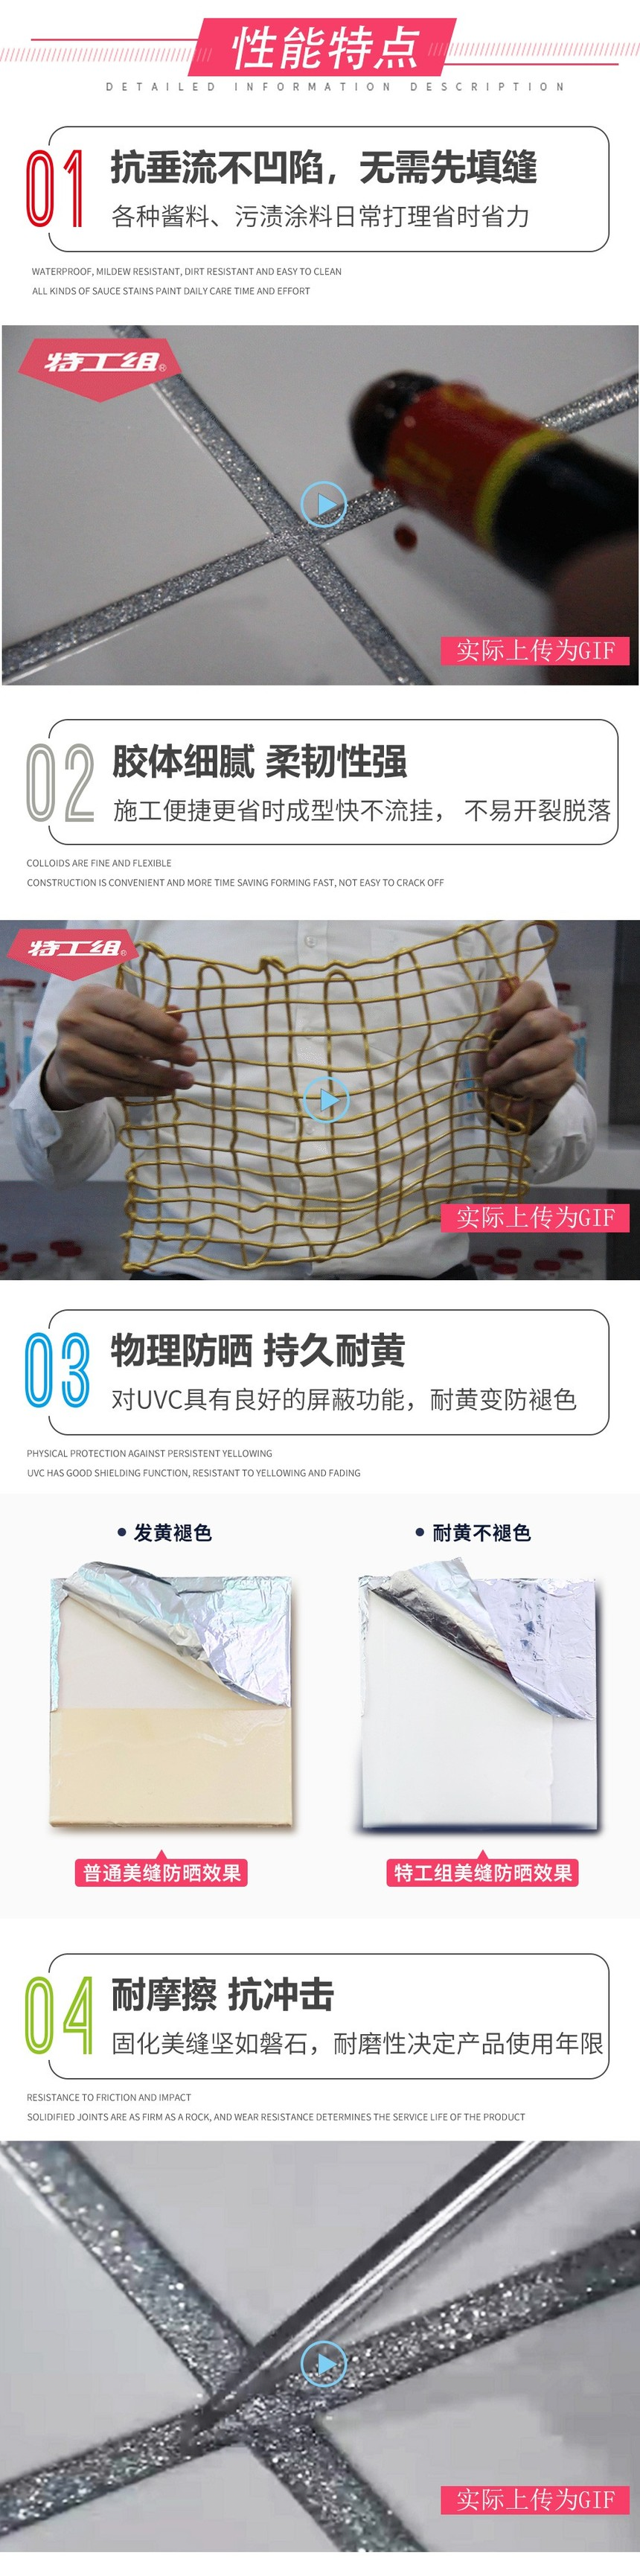 DIY美縫詳情頁-0603-定稿(1)_12.jpg